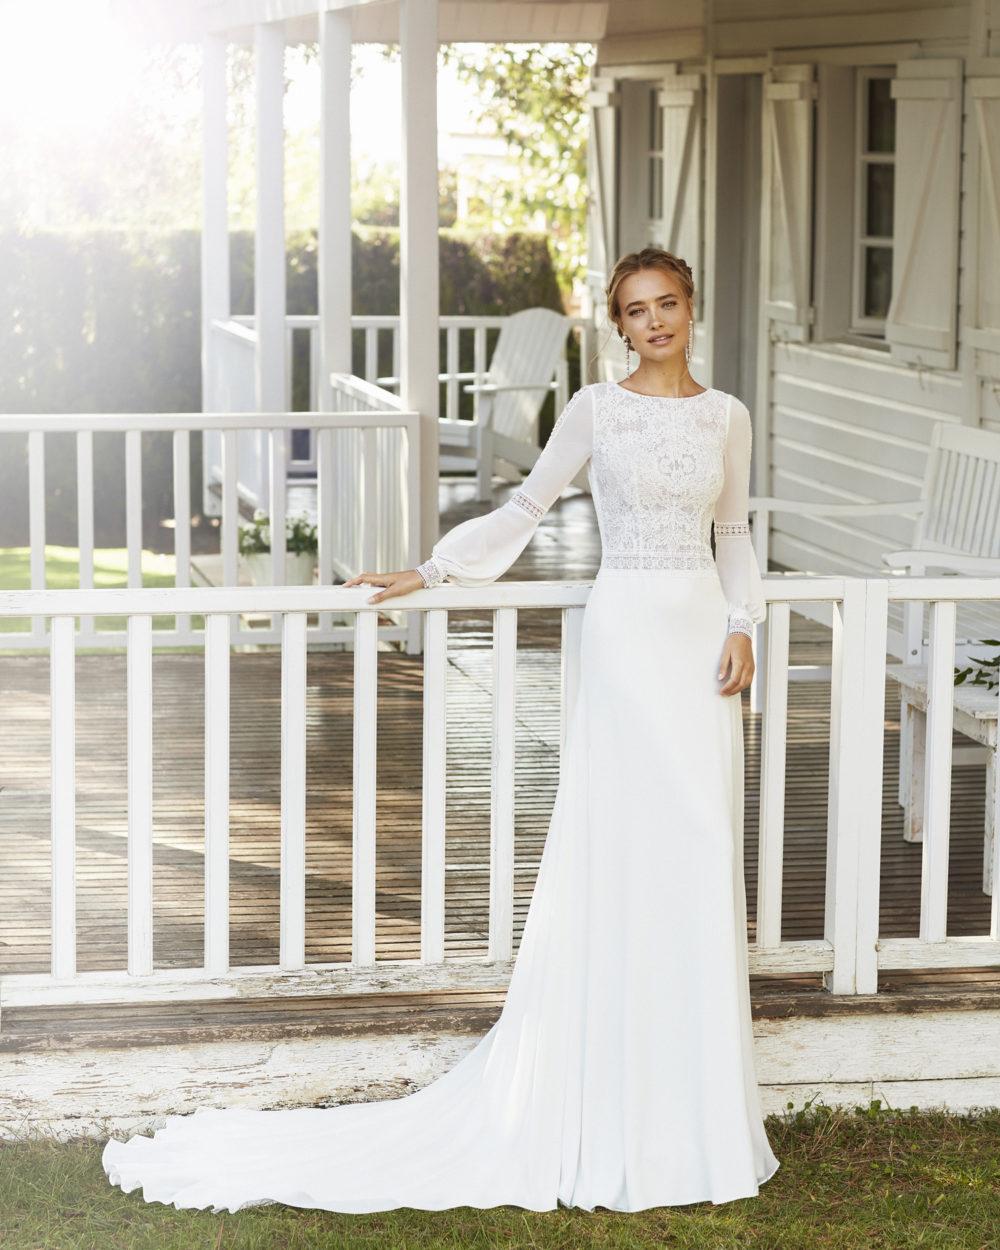 Mariages: abito da sposa Rosa Clarà 2020 a Vicenza, Verona, Padova, Veneto 4A101 CABANA